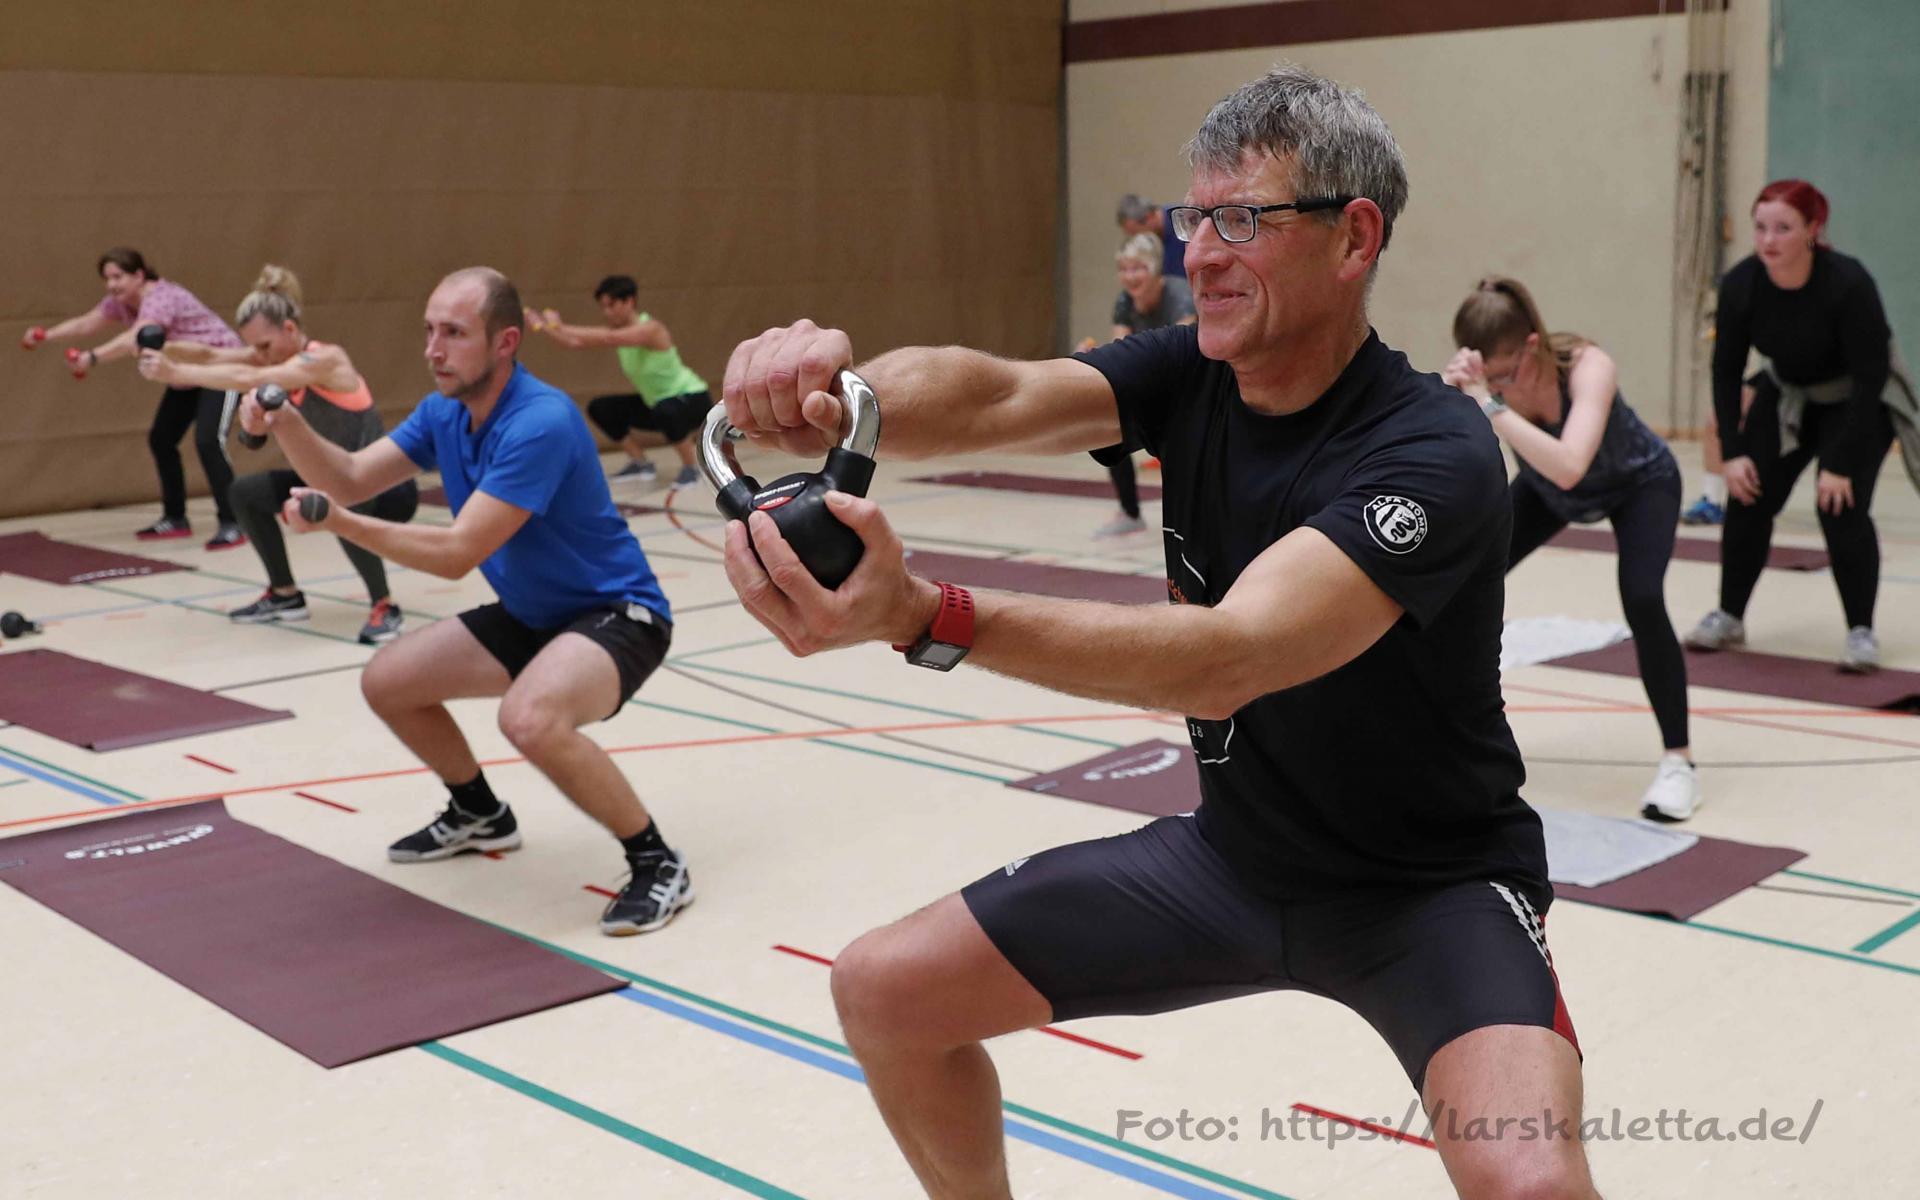 Lars-Kaletta_go-sports-2019-23